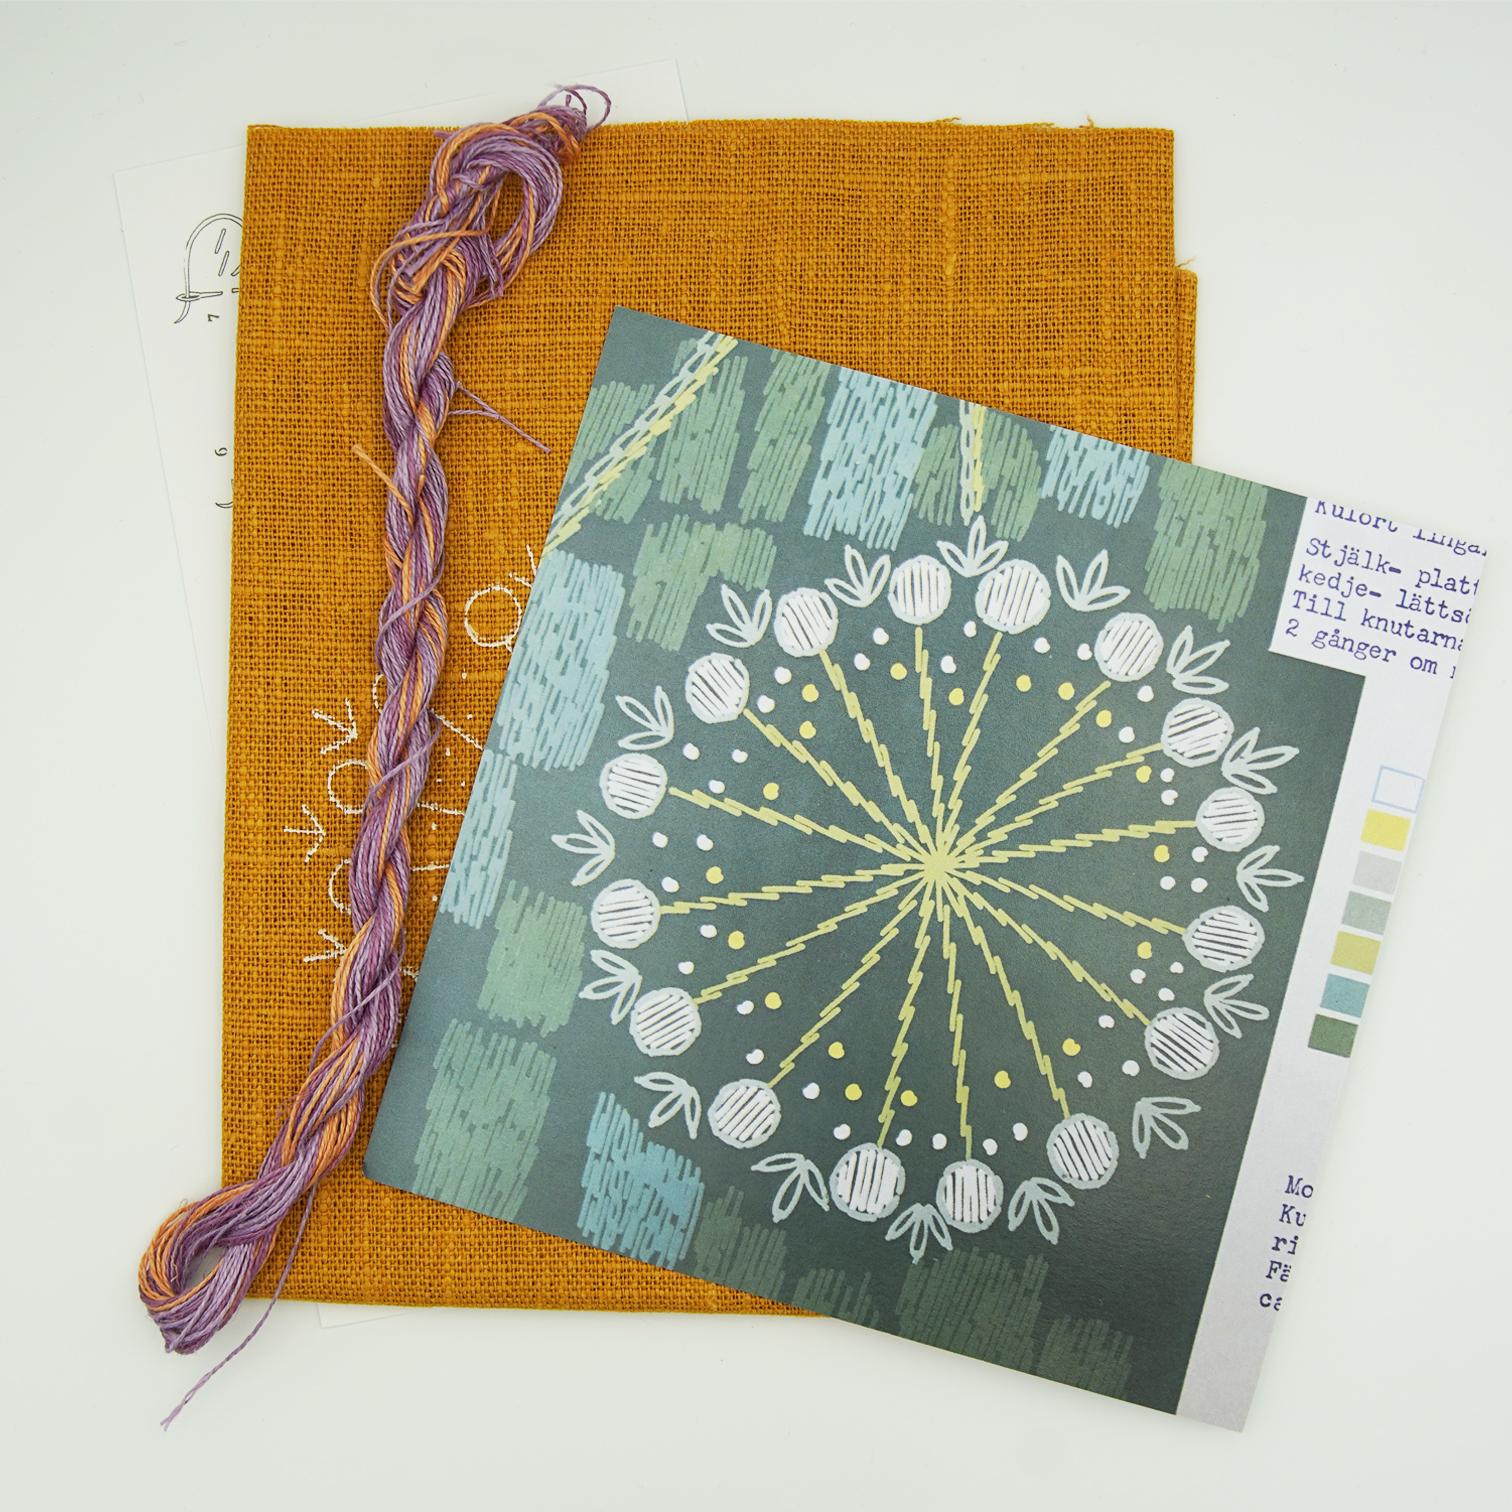 Linladan - Seed Ball - Swedish Embroidery Kit 159